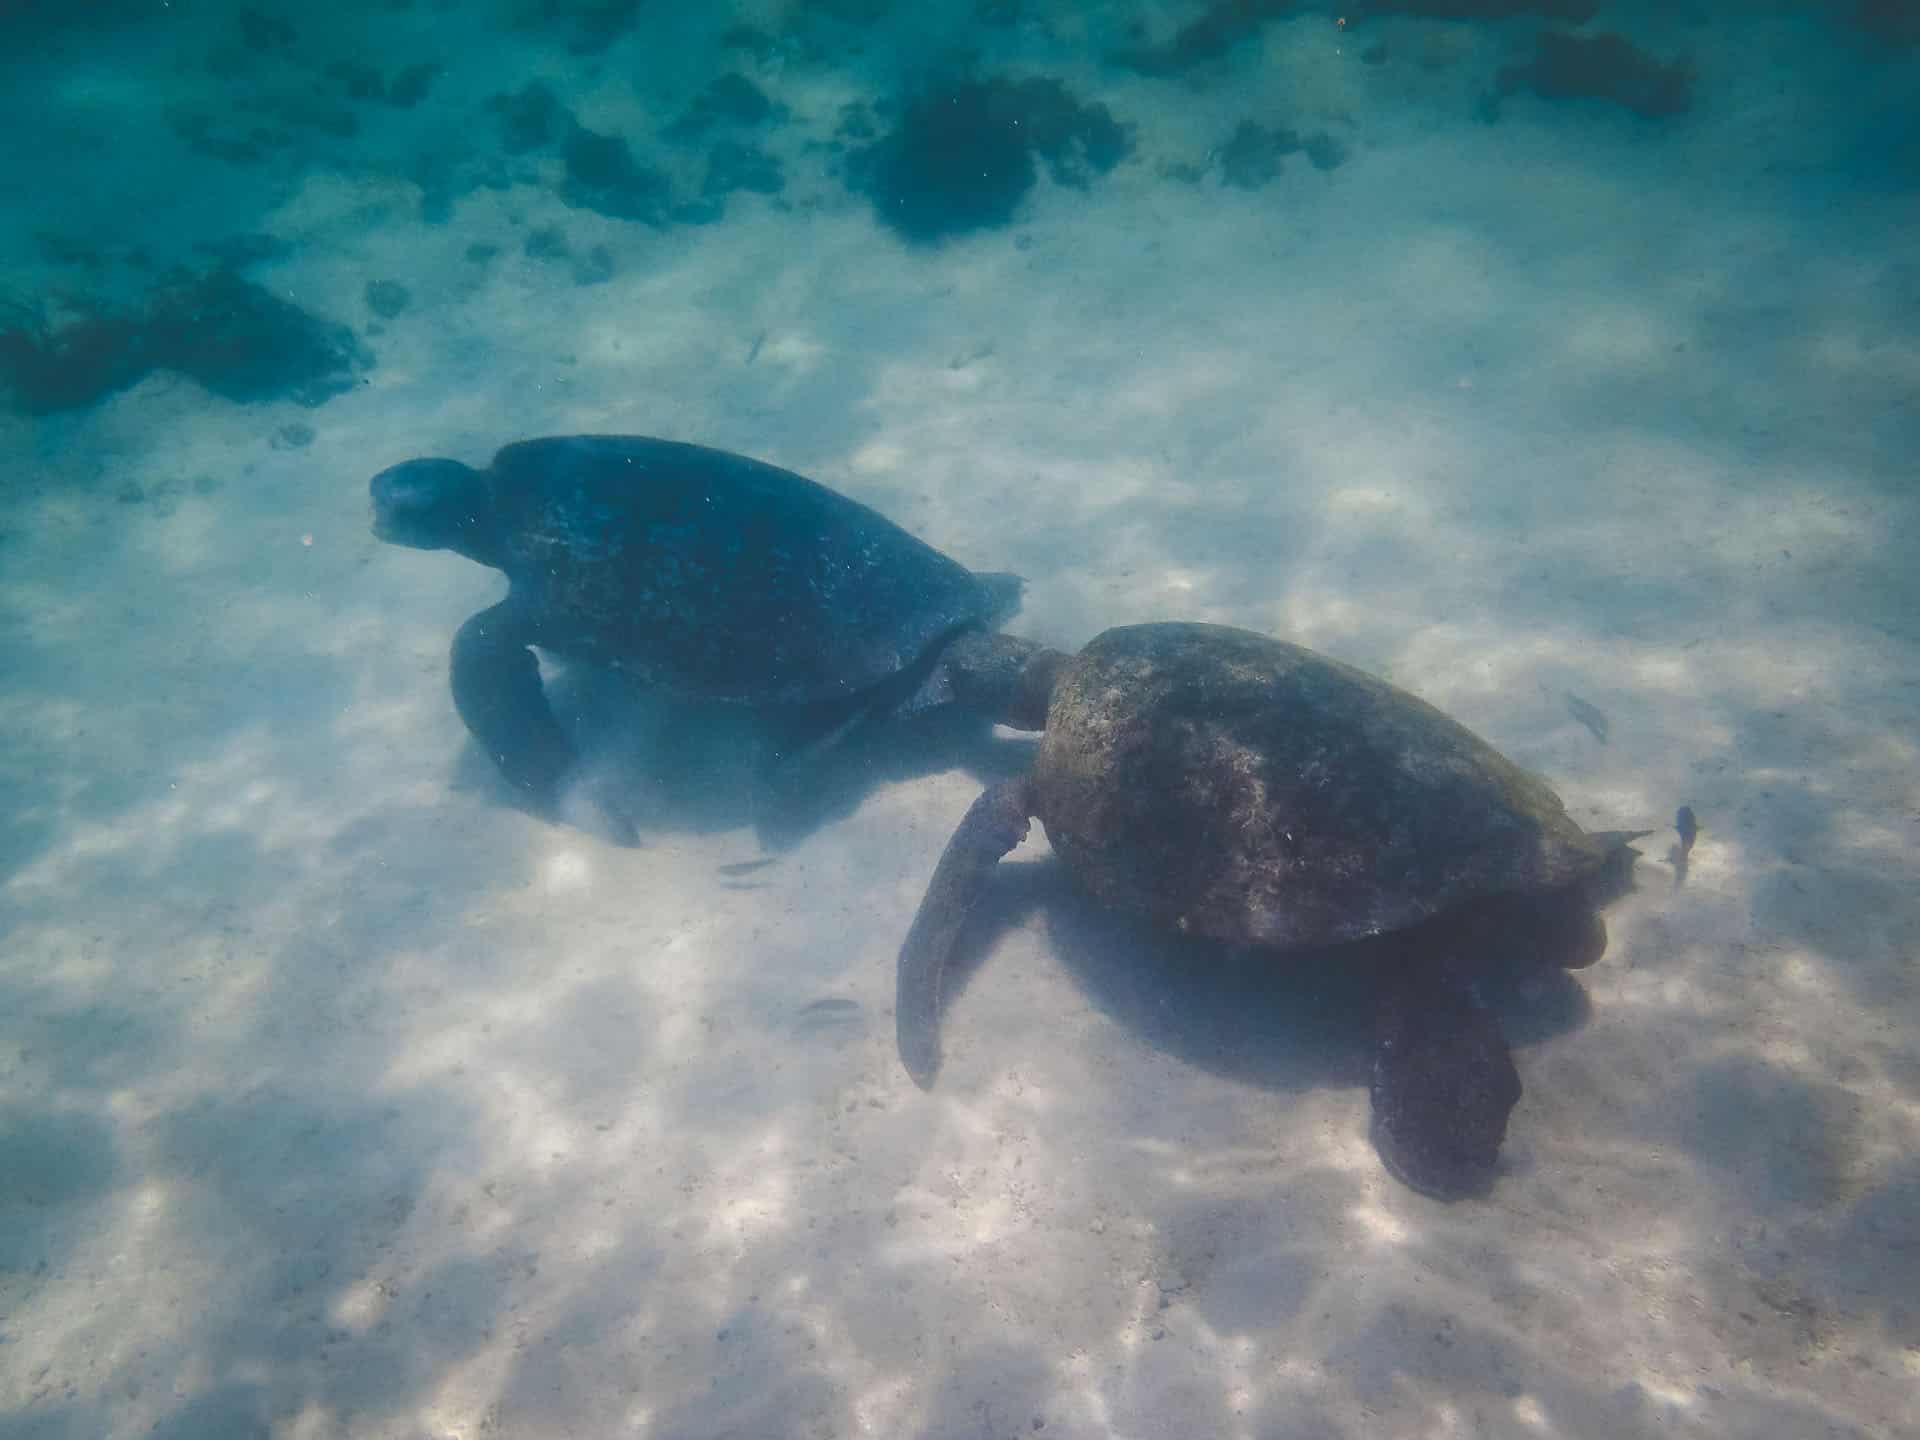 galapagos islands marinelife sea turtles